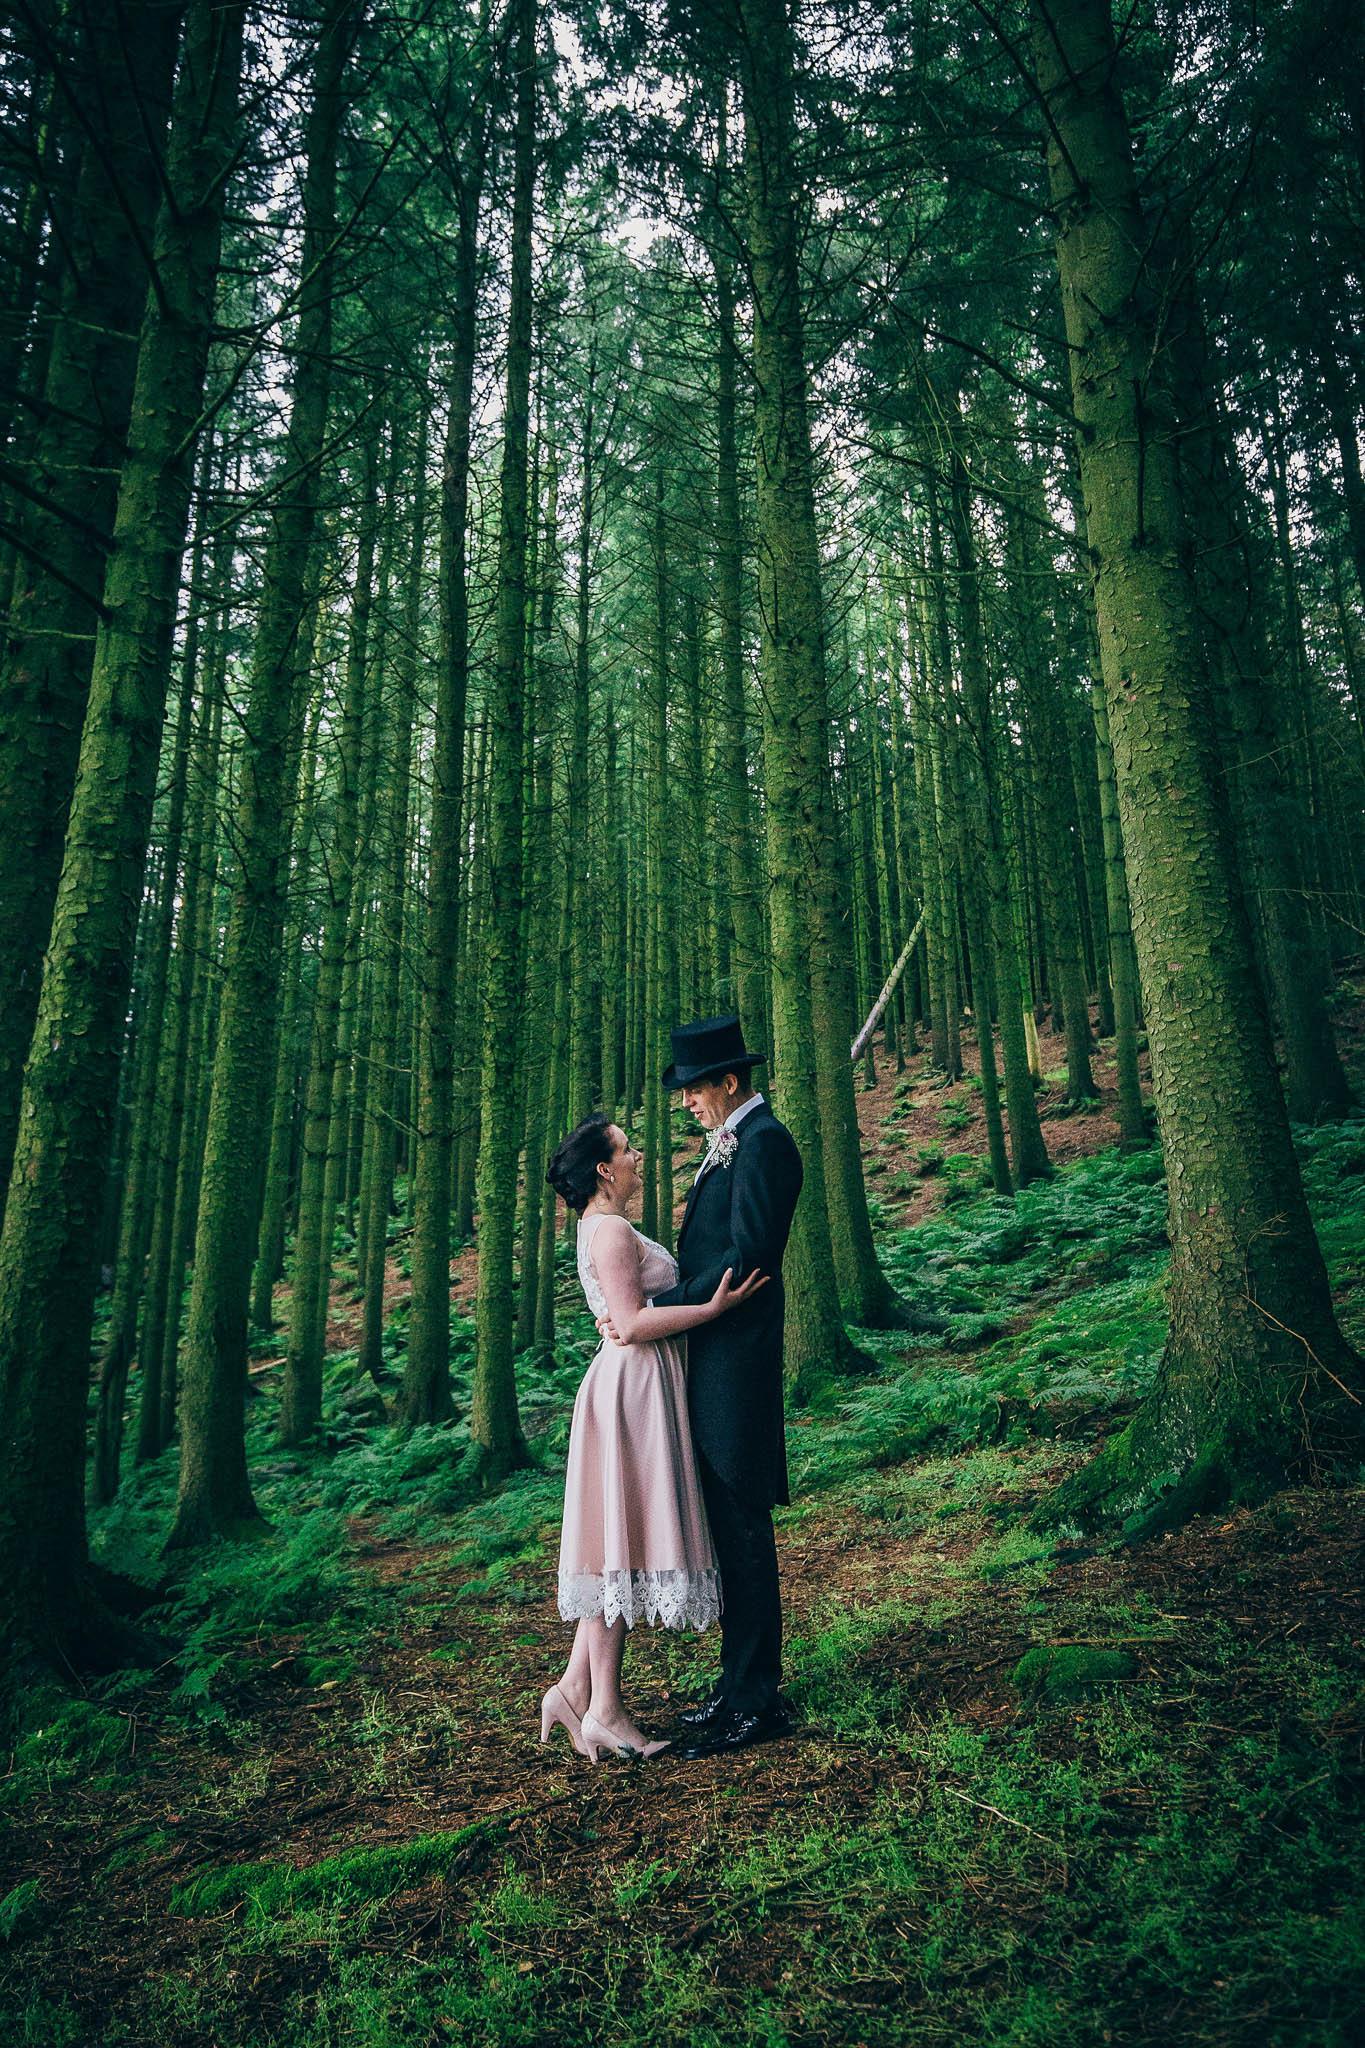 Norway+wedding+photographer+elopement+pre+wedding+Rogaland+bryllupsfotograf+Casey+Arneson-108.jpg